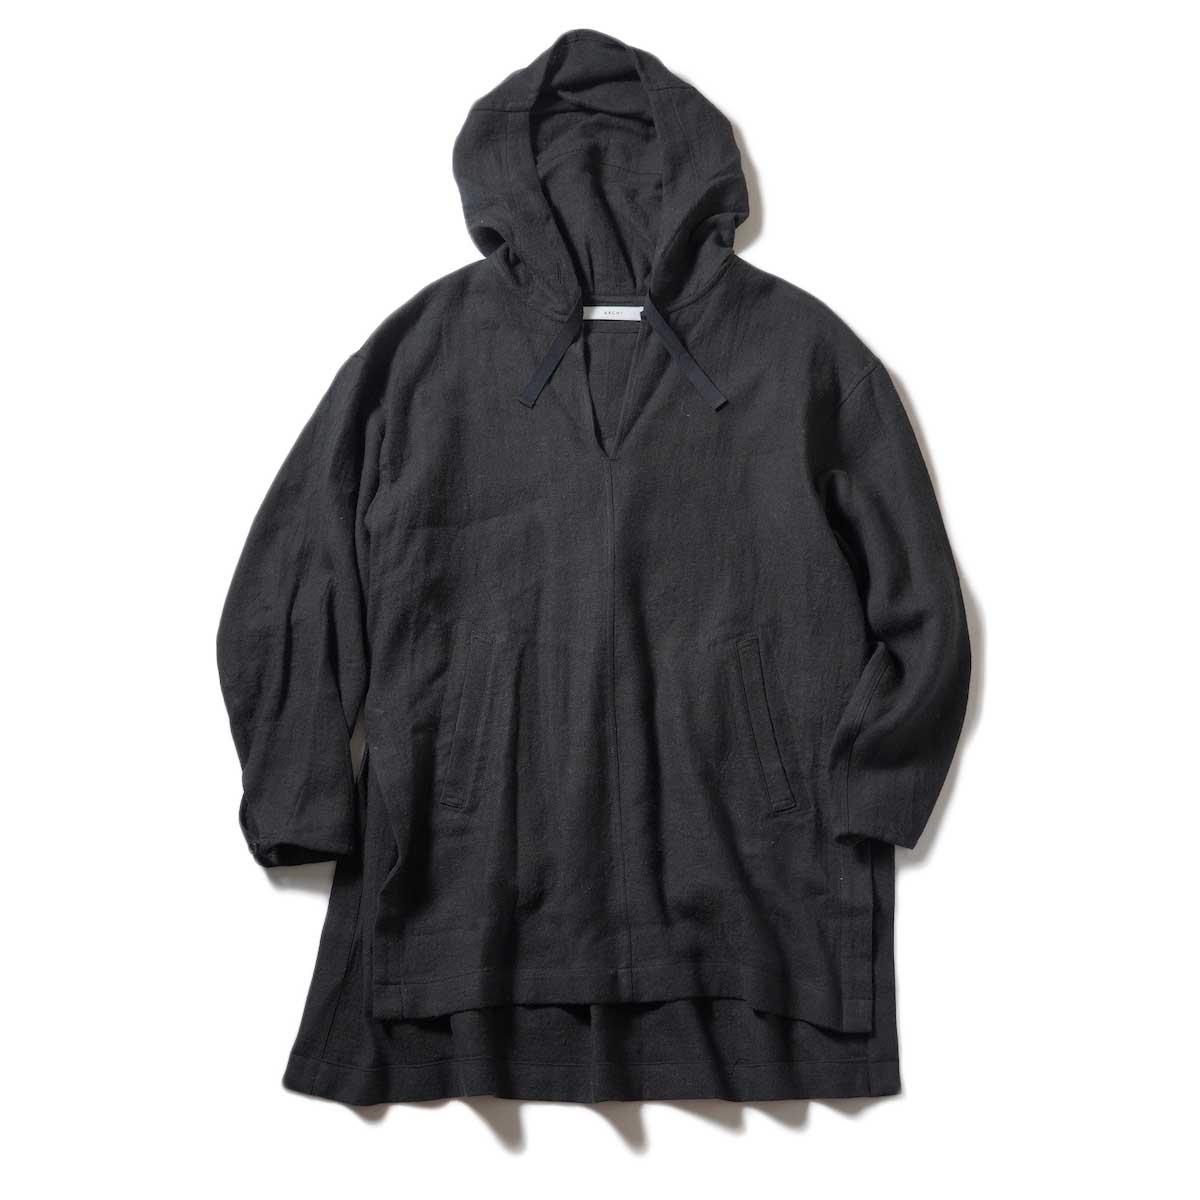 ARCHI / SOFT TWIST TWILL HOODIE OVER SHIRTS (Black)